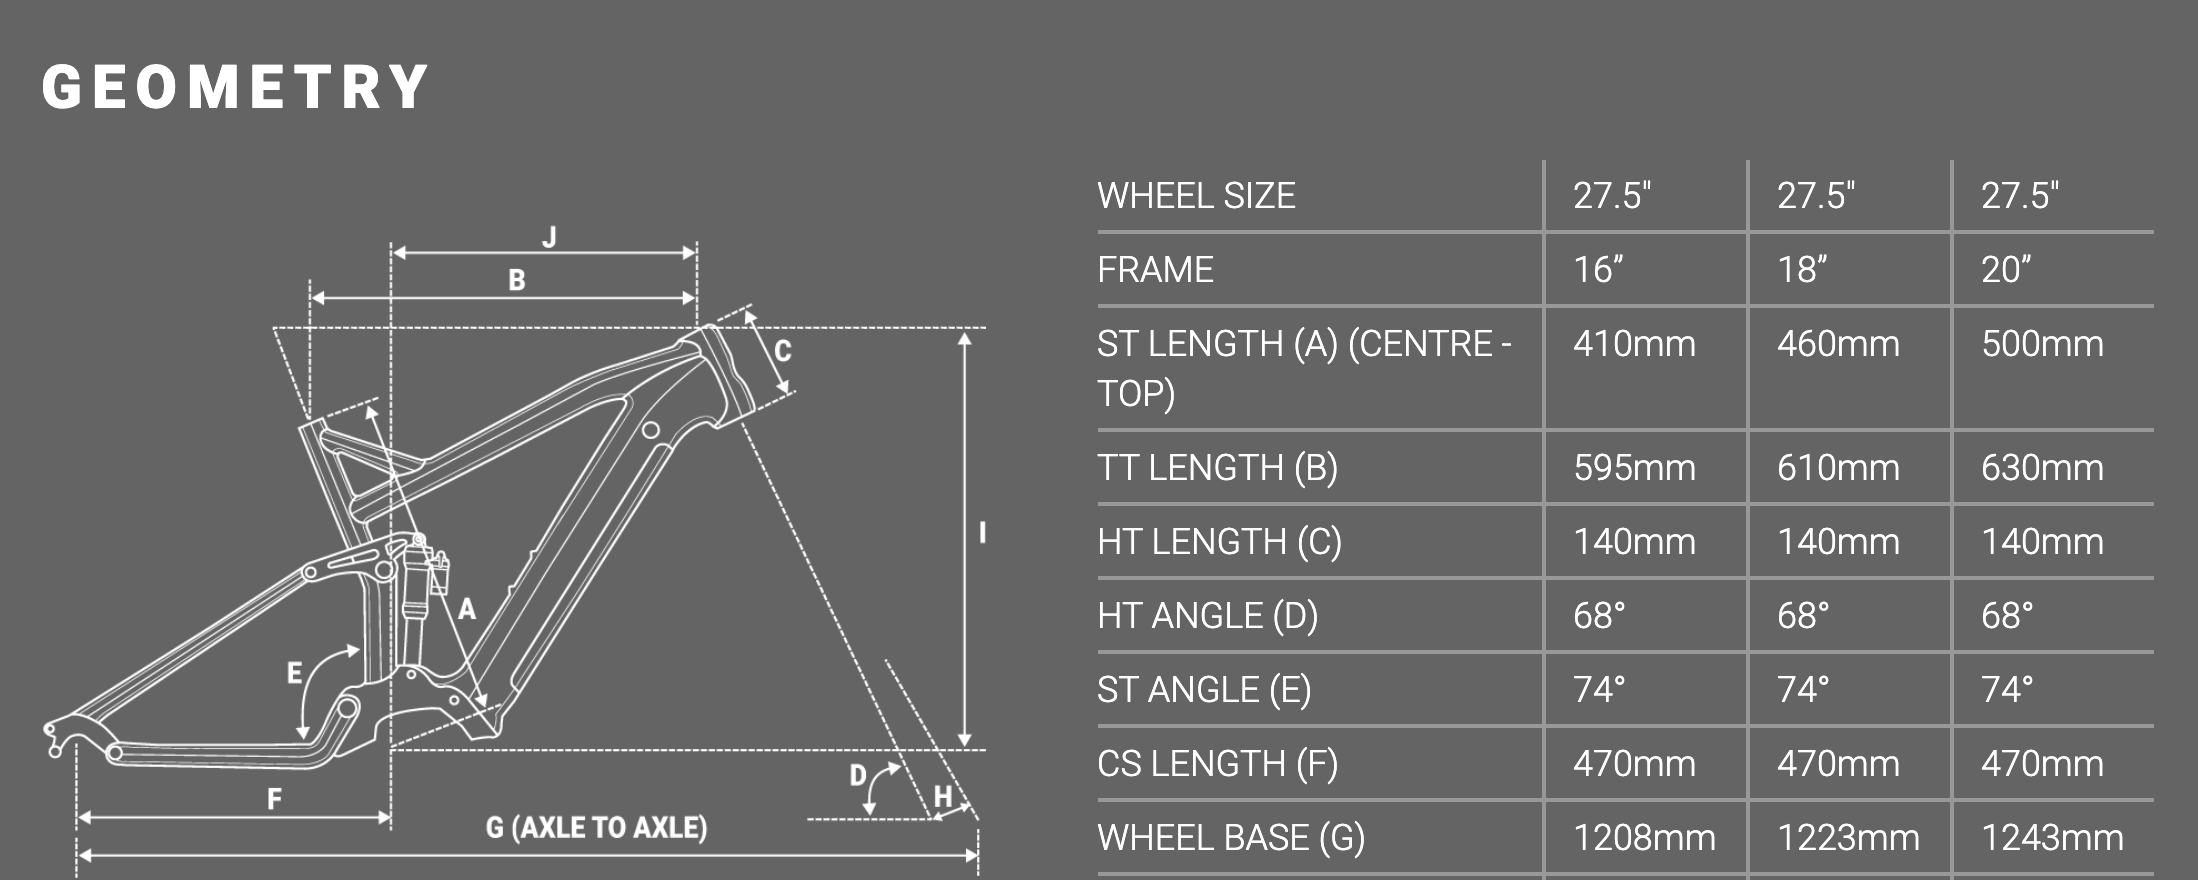 Forme Lathkill FSE Geometry Table